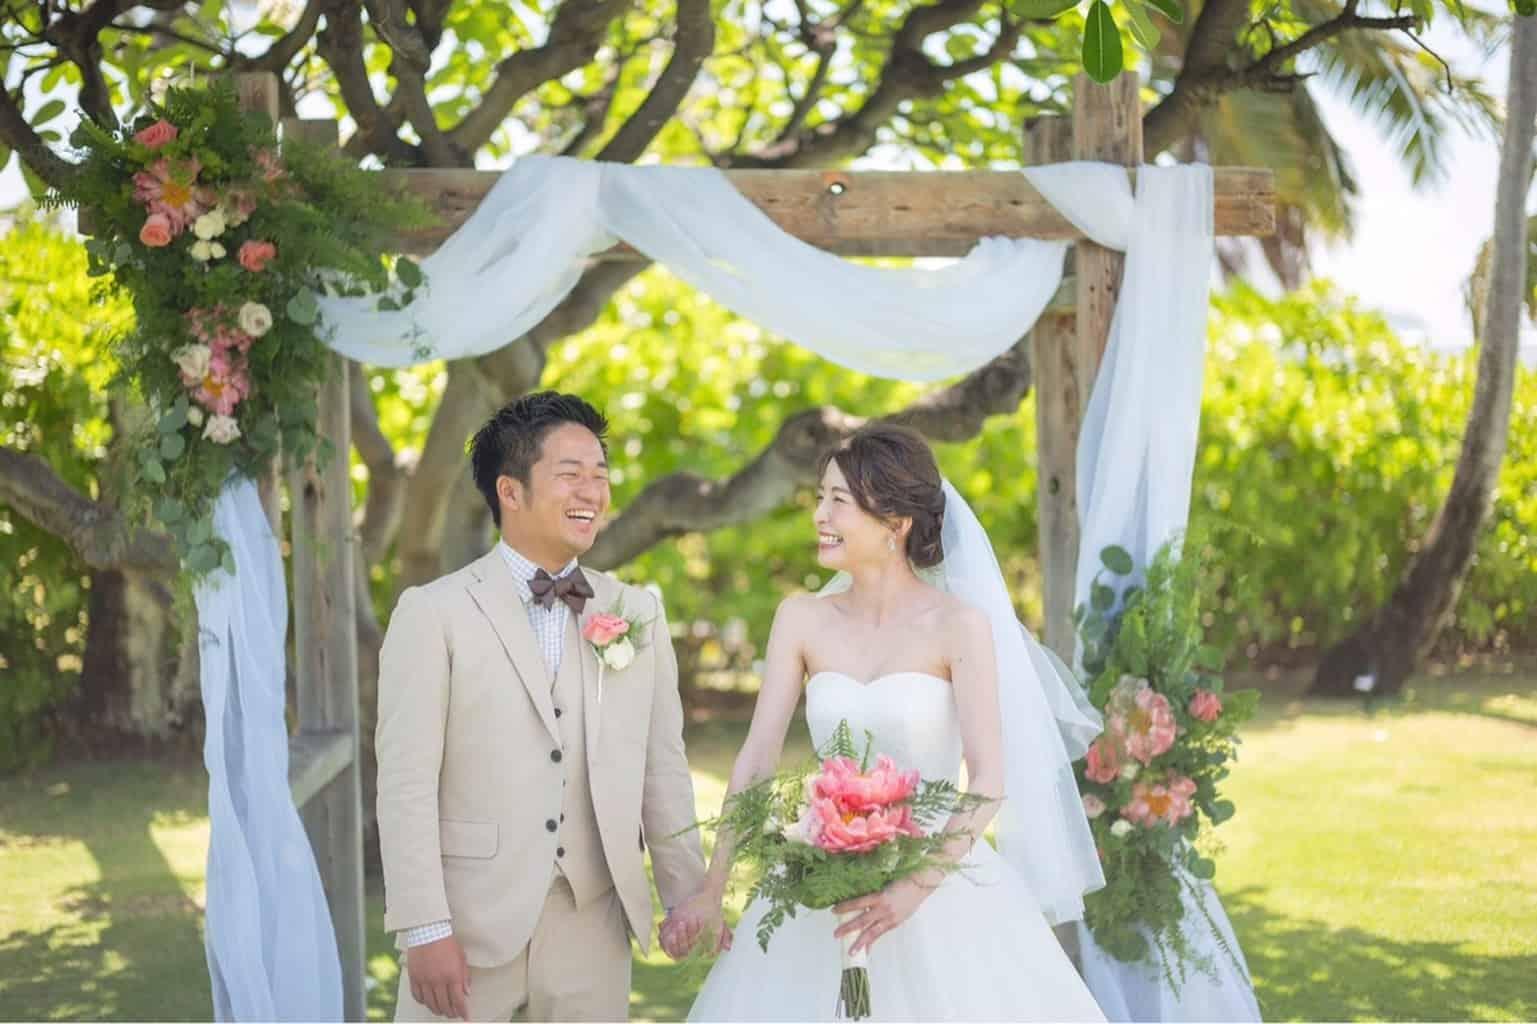 【Vol.4】編集部がおすすめする!インスタで人気の先輩花嫁をご紹介♡のカバー写真